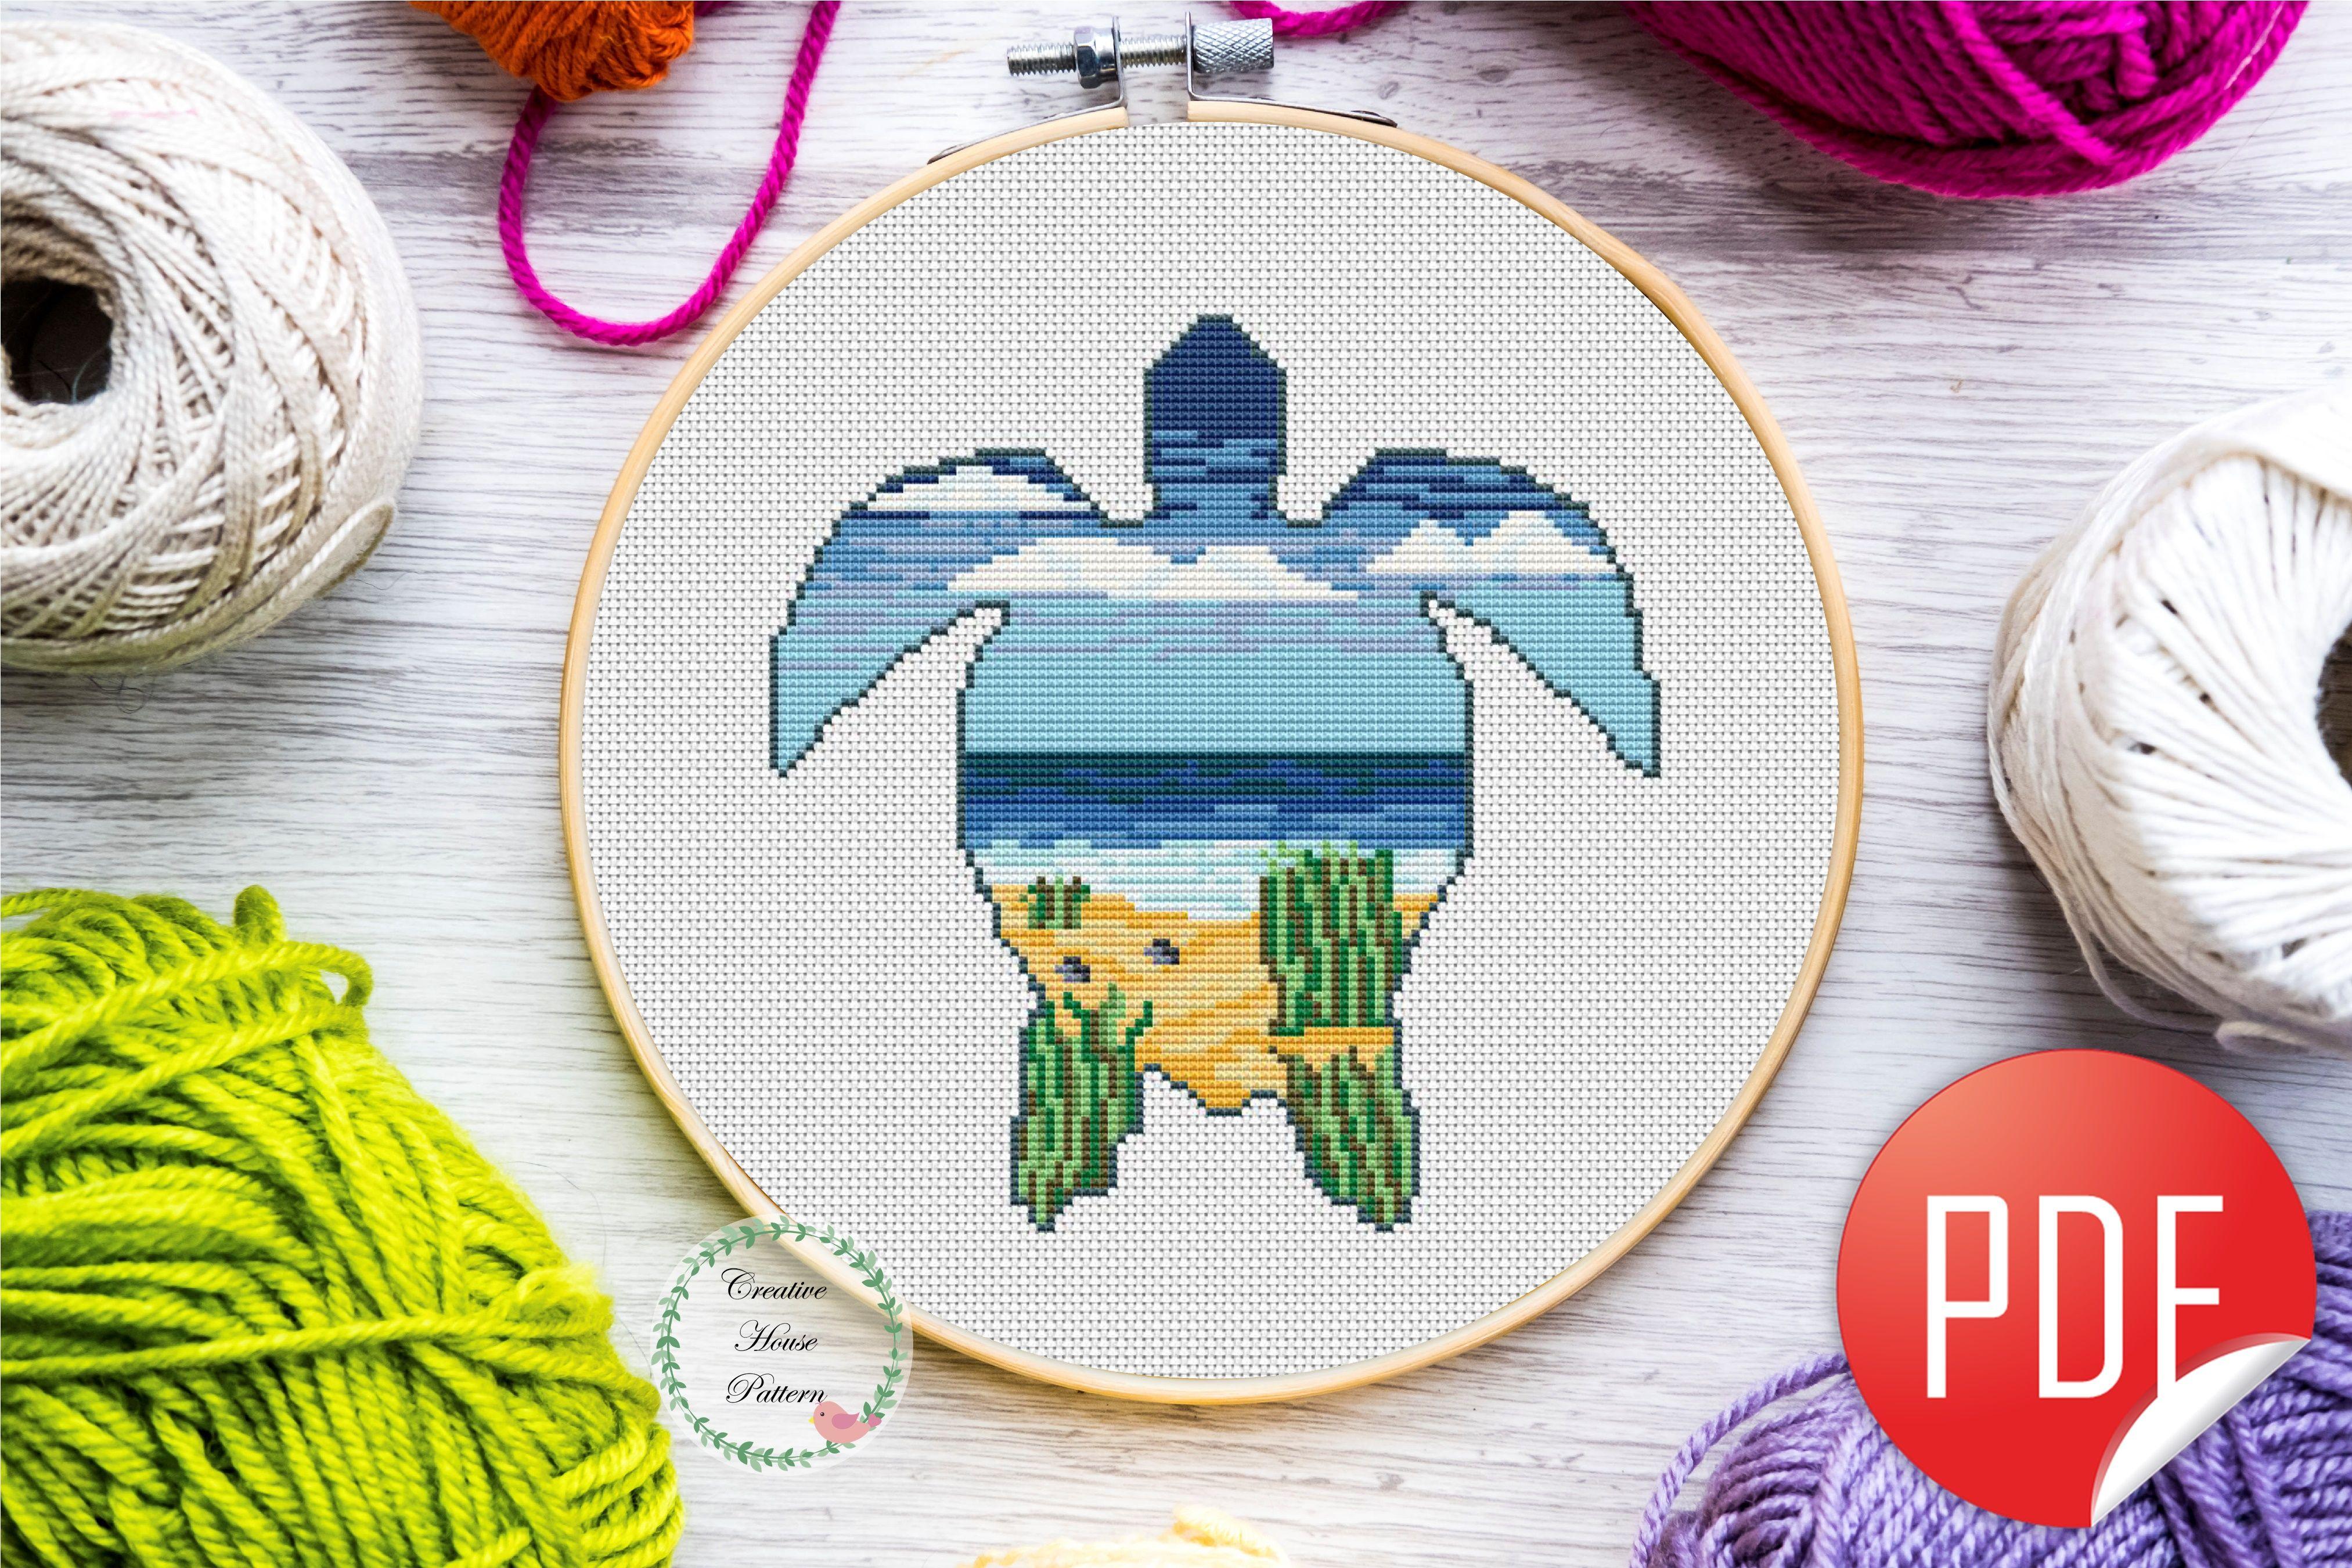 Chart Counted Cross Stitch Pattern Needlework Xstitch DIY Craft Winter Harbor